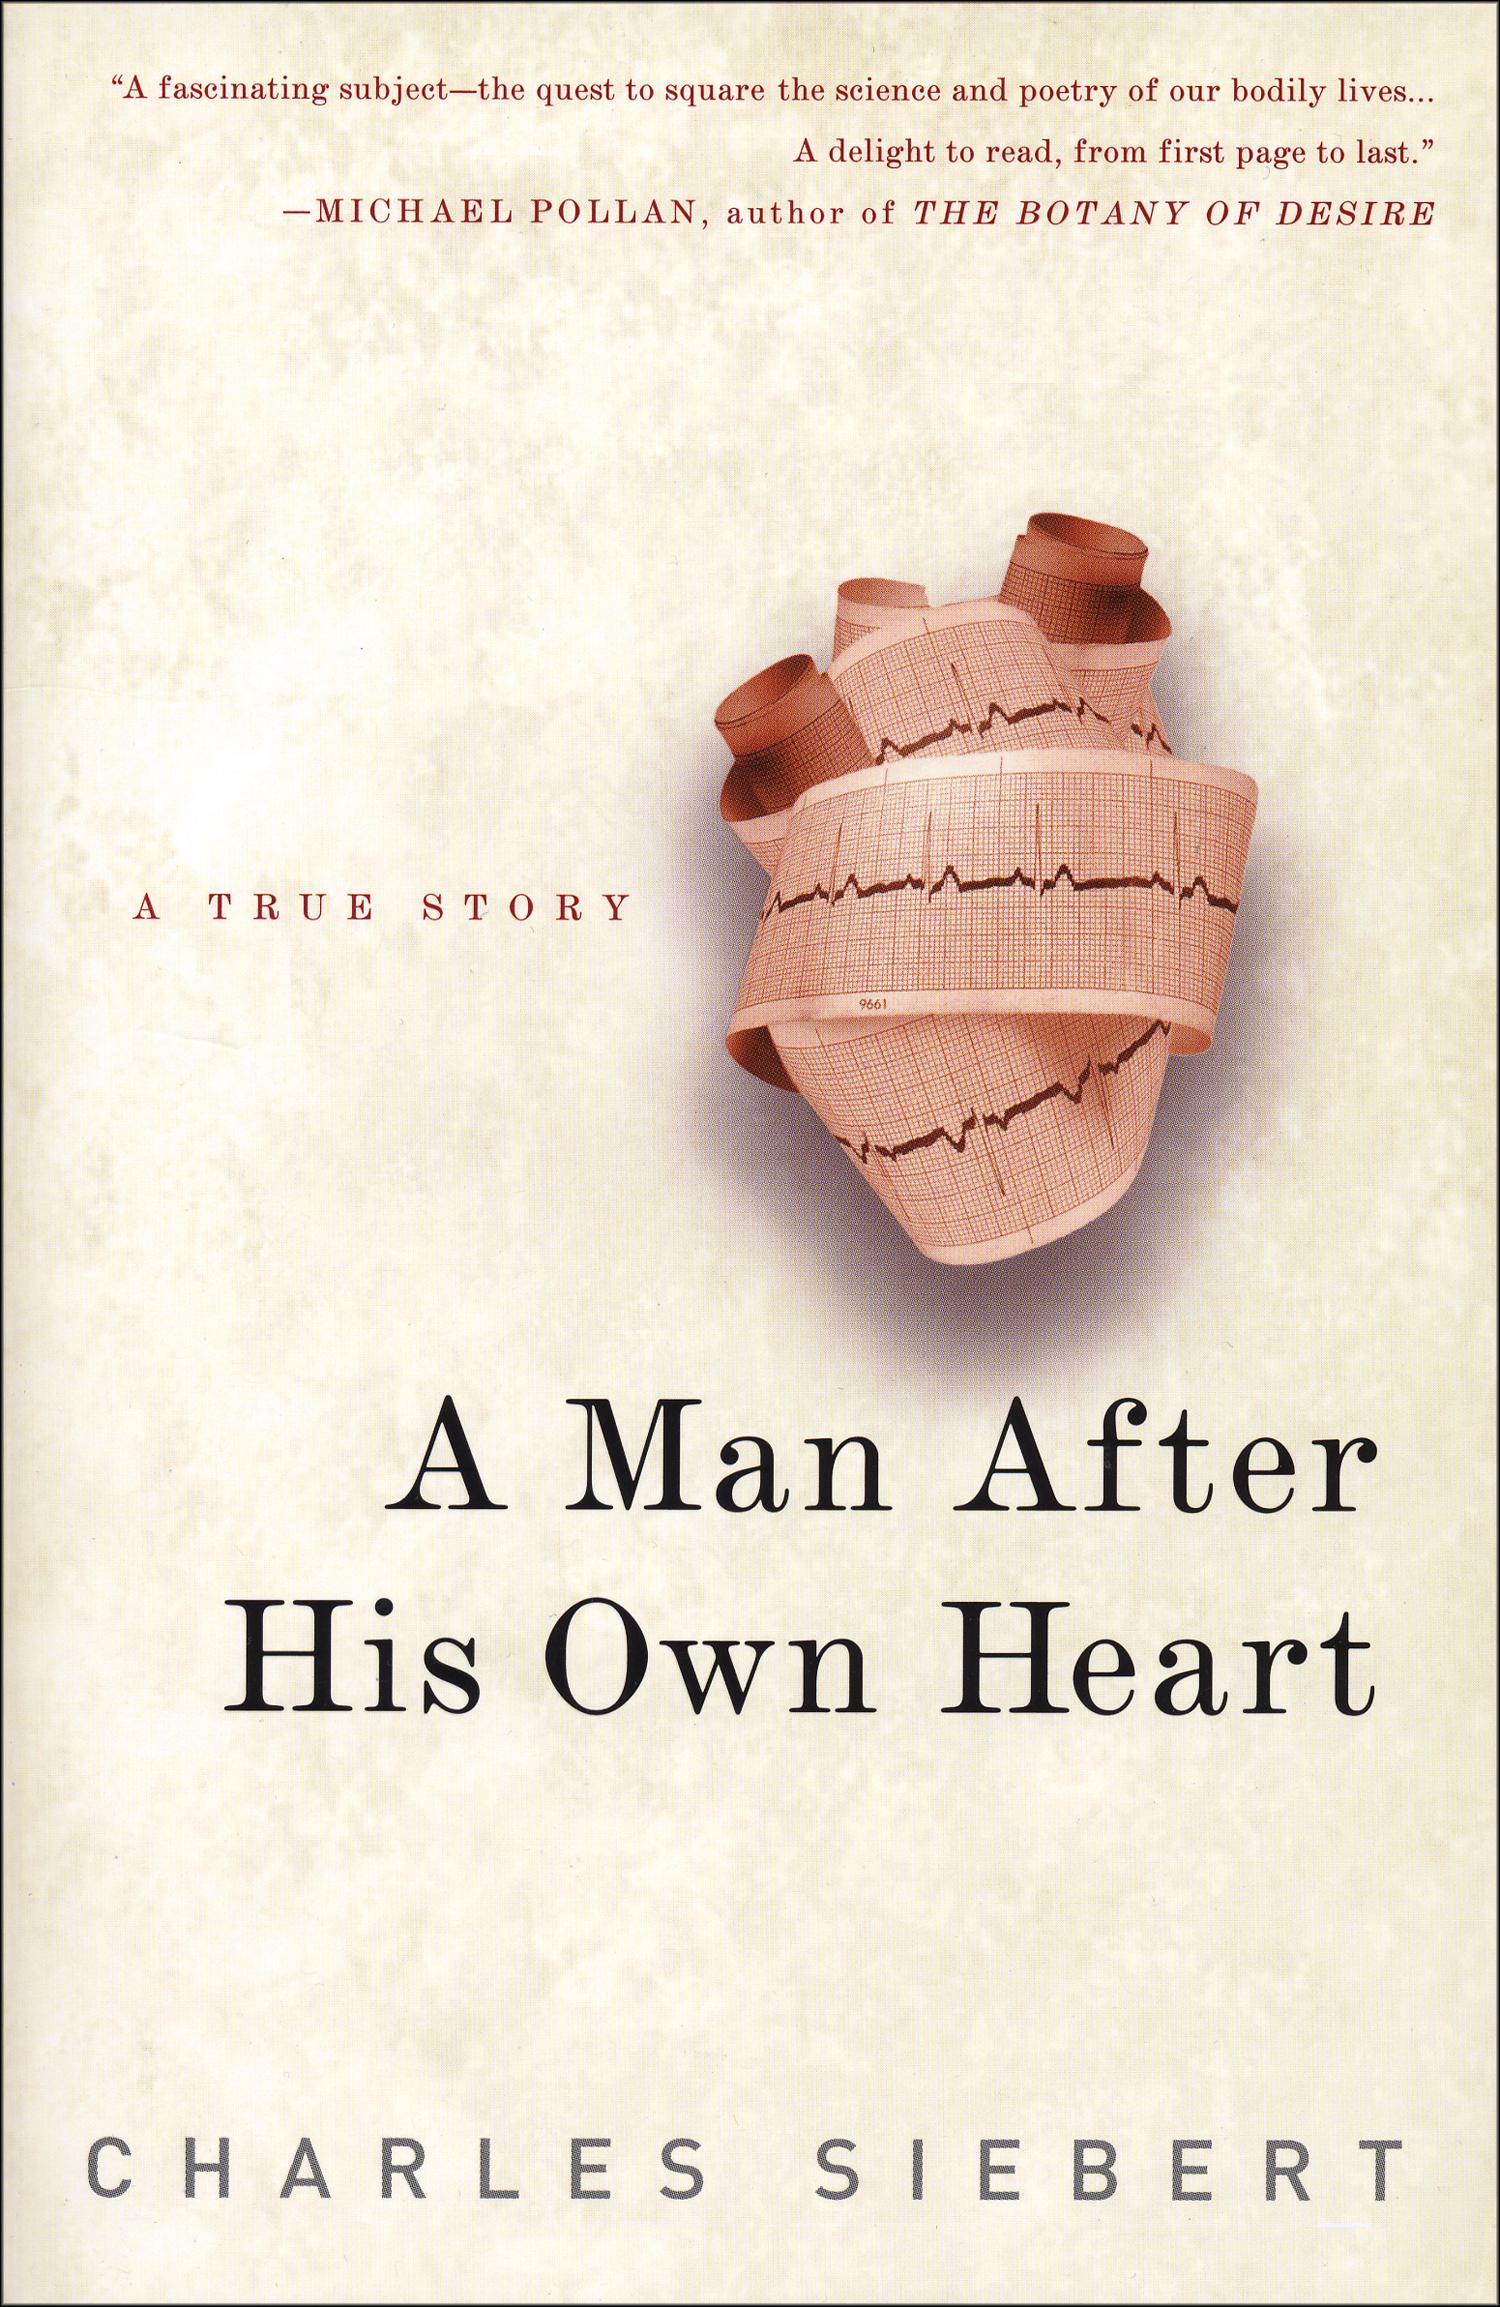 A-MAN-AFTER-HIS-OWN-HEART-tpb-ss6.jpg